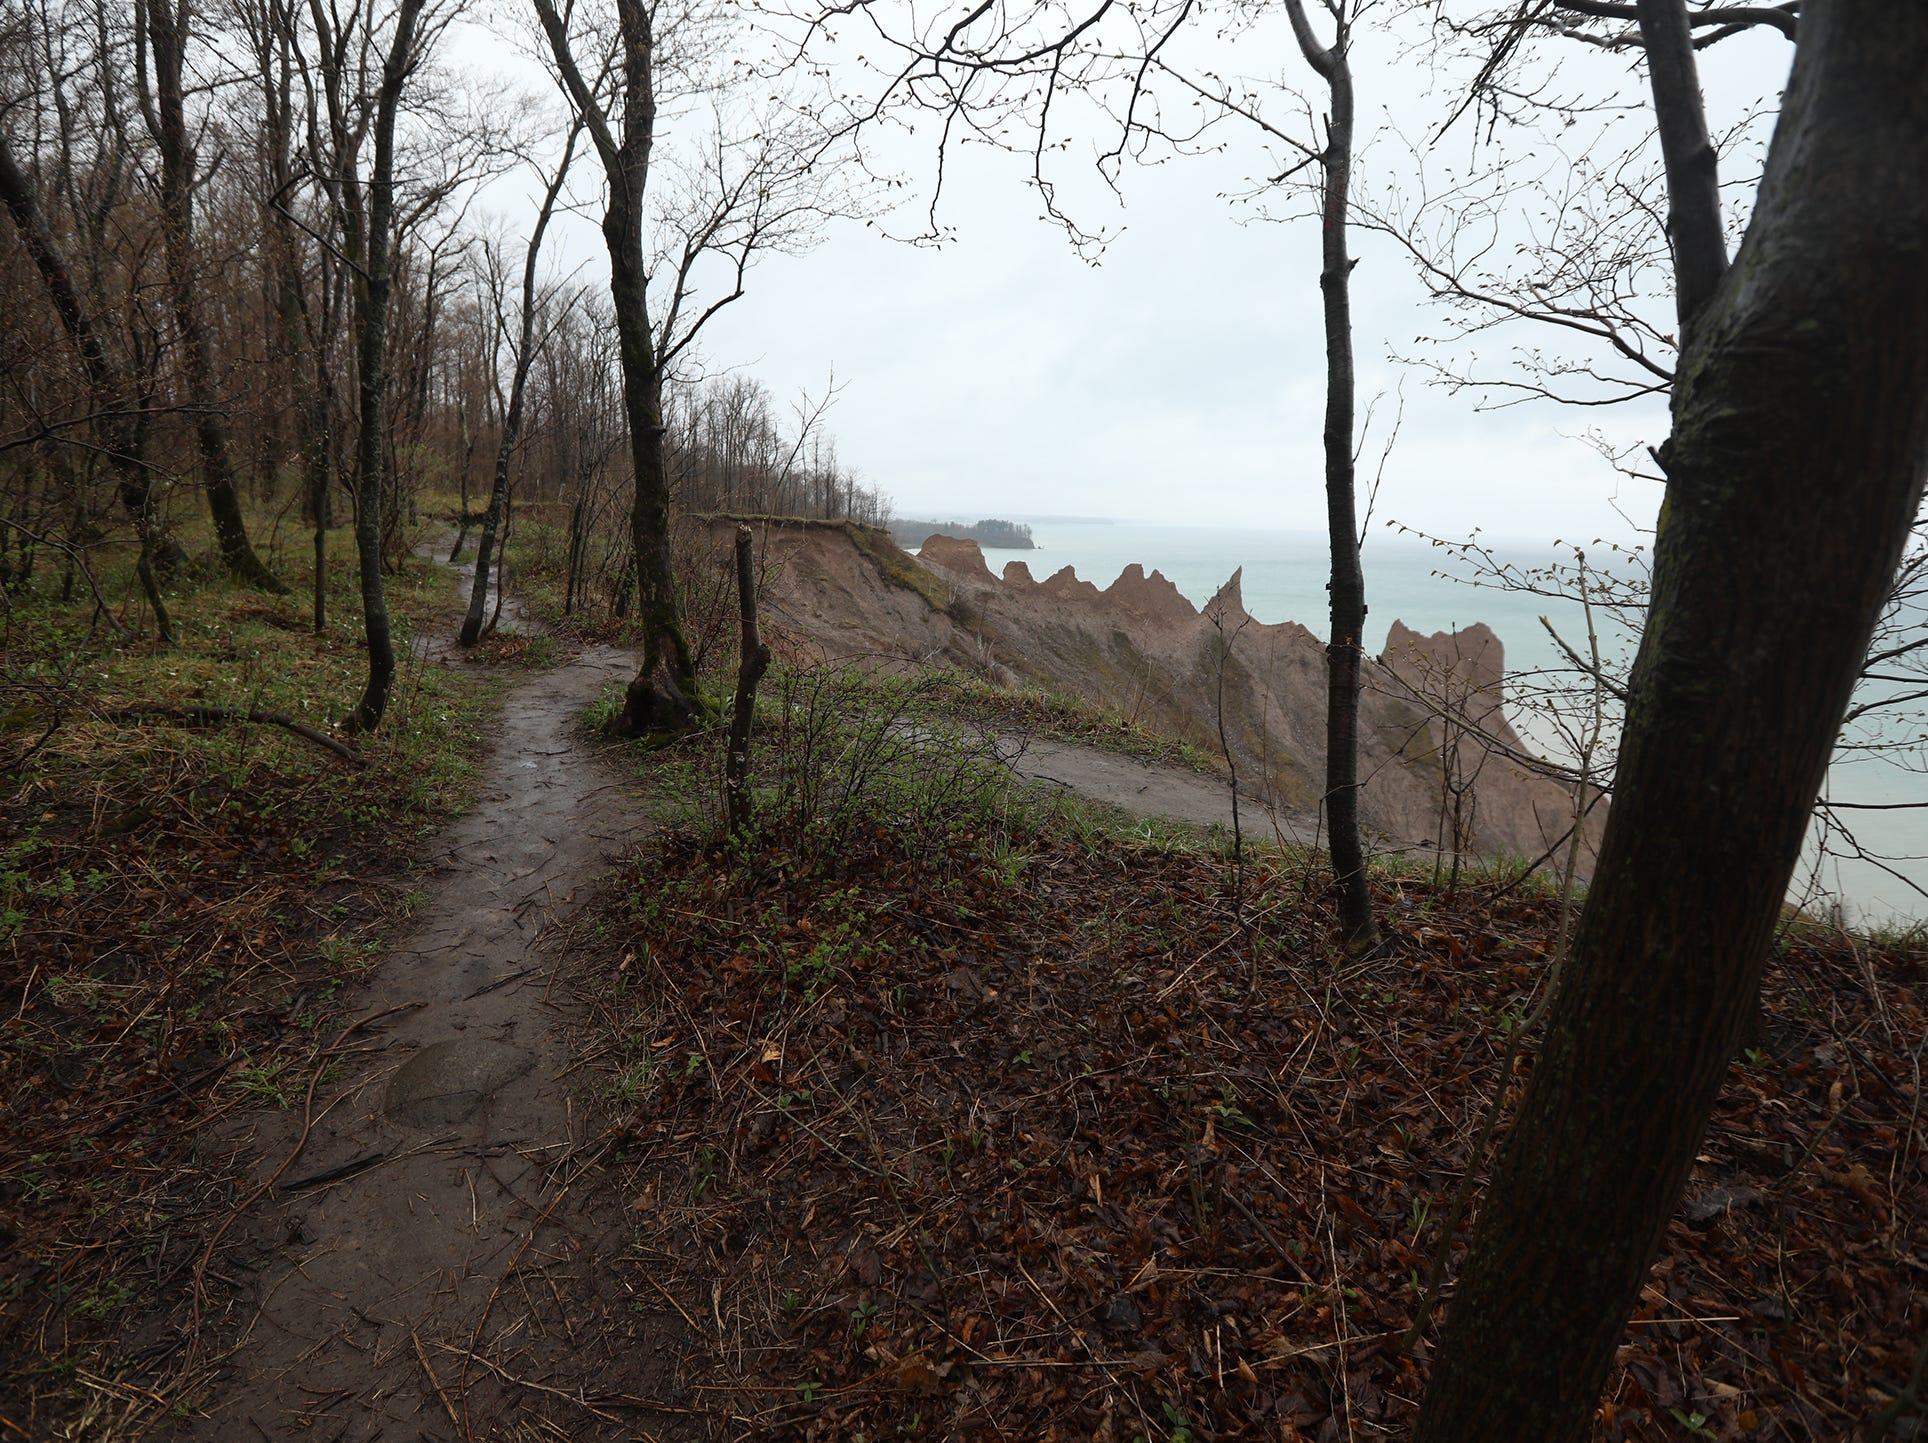 Every year erosion eats away Chimney Bluffs.